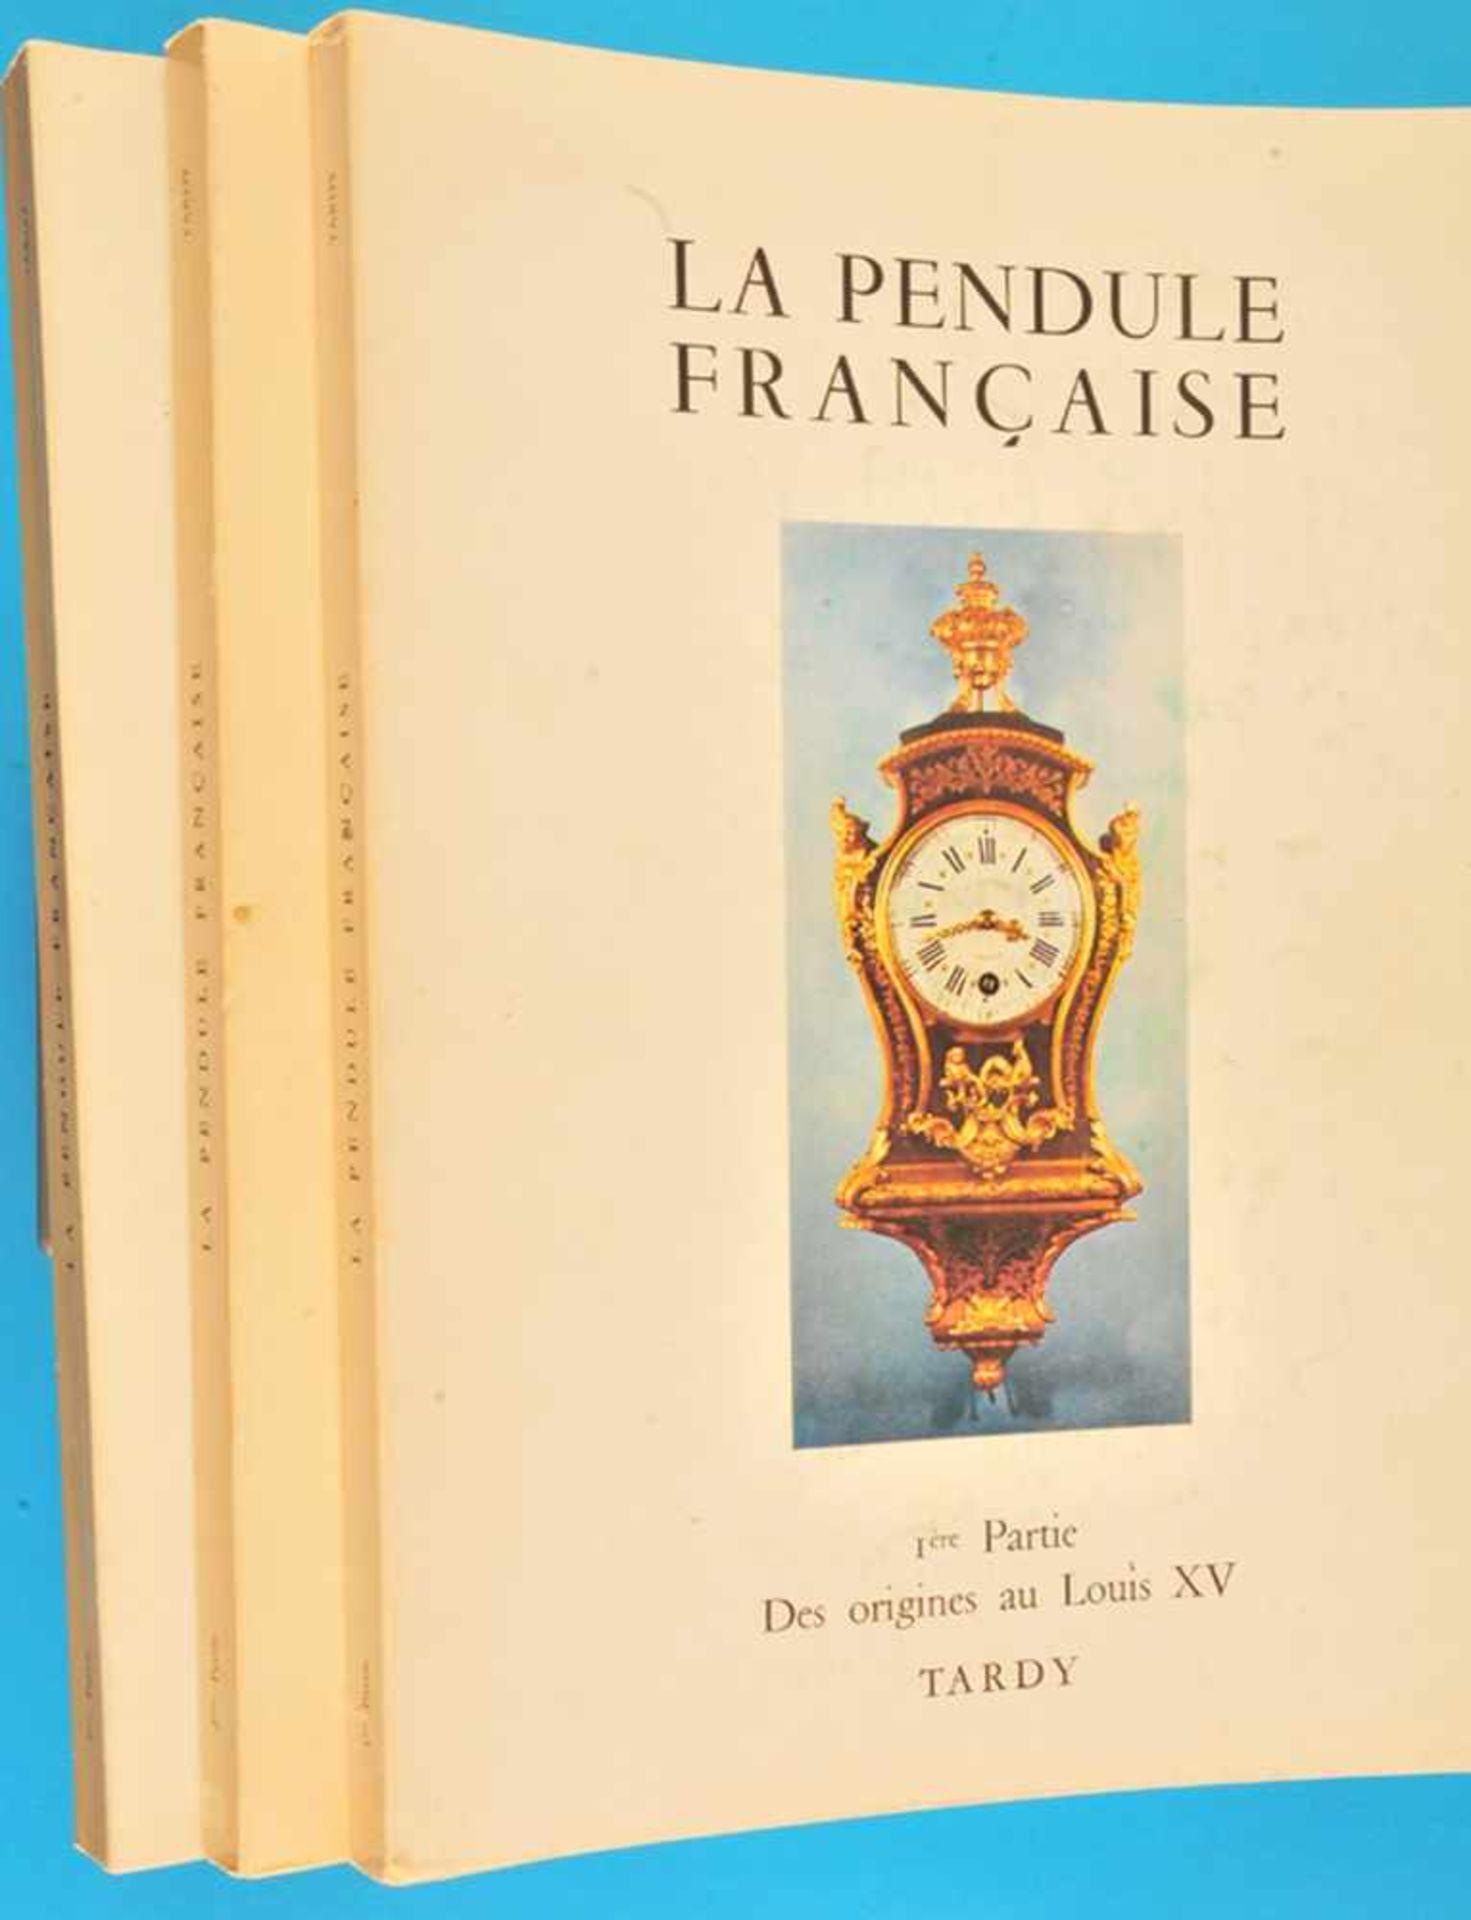 Los 1 - Tardy, La Pendule Francaise, Bände 1 - 3Tardy, La Pendule Francaise, Bände 1 - 3, 1974/75,